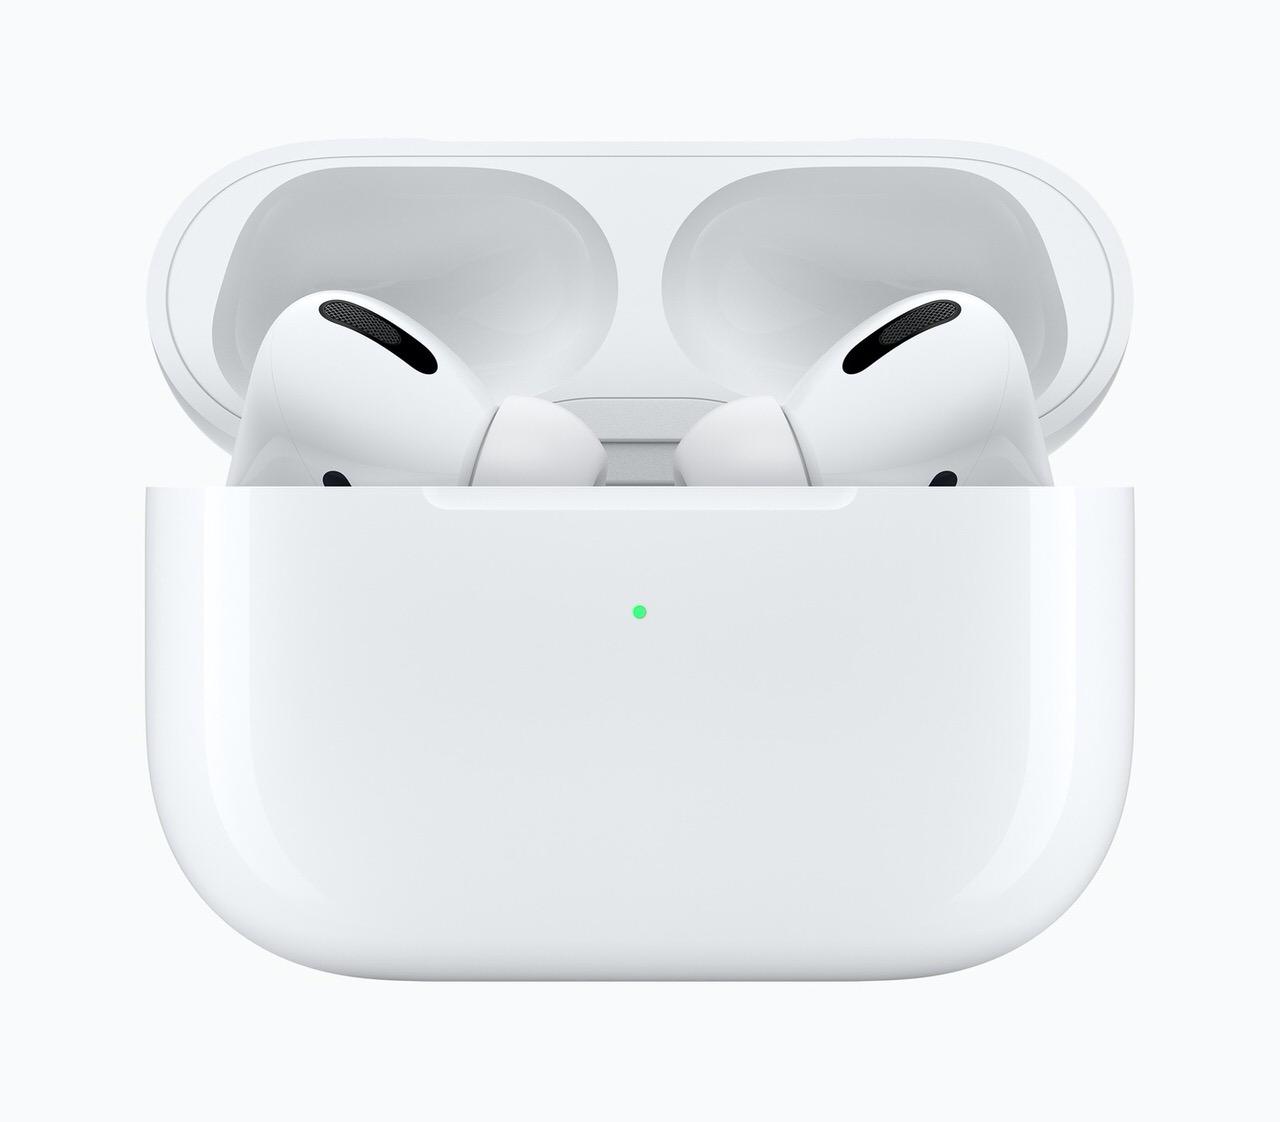 Apple「AirPods Pro」を発表 〜10月30日より販売開始